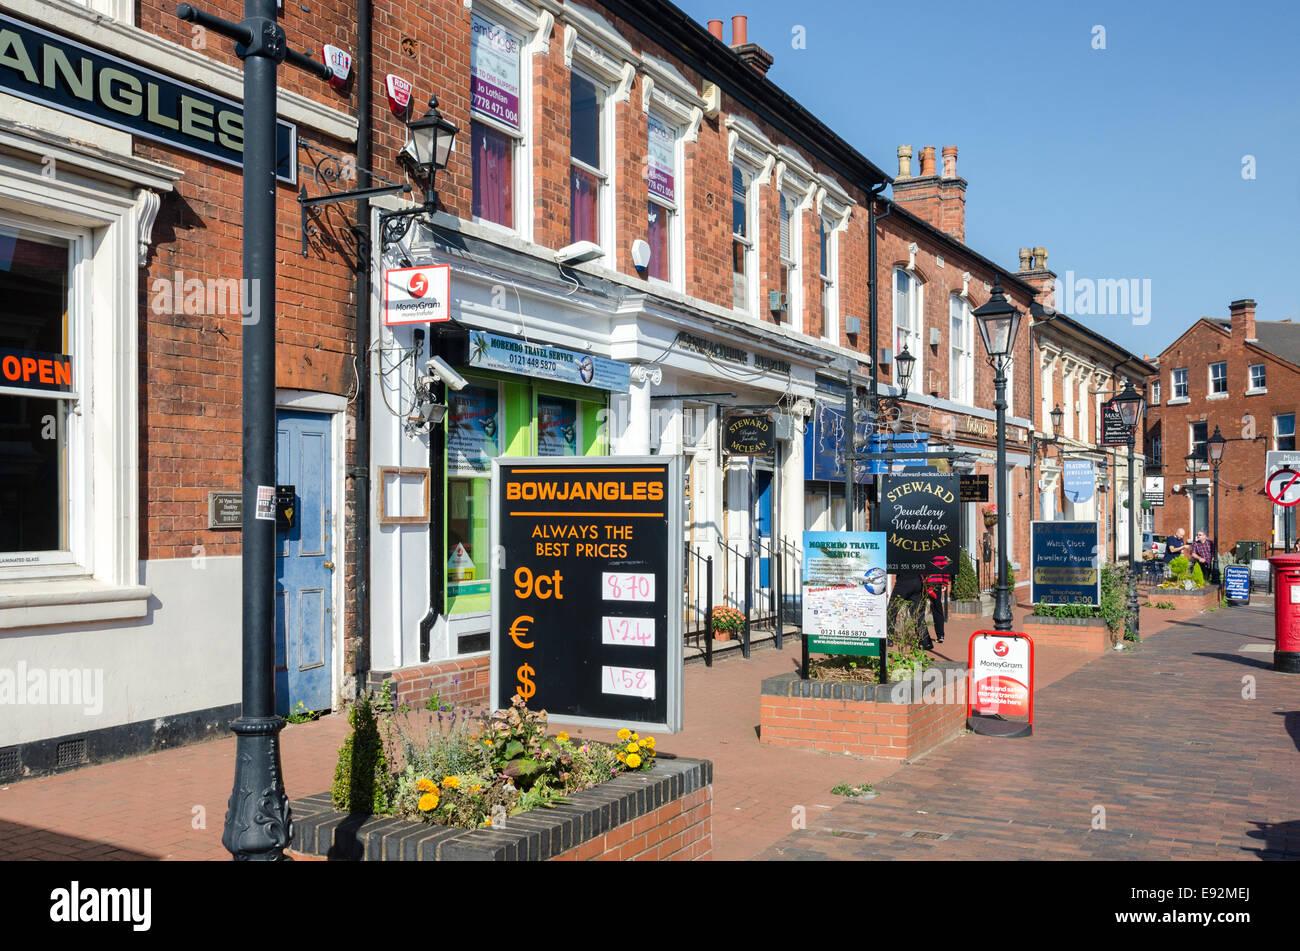 A Row Of Jewellery Shops On Vyse Street In Birminghams Quarter Hockley